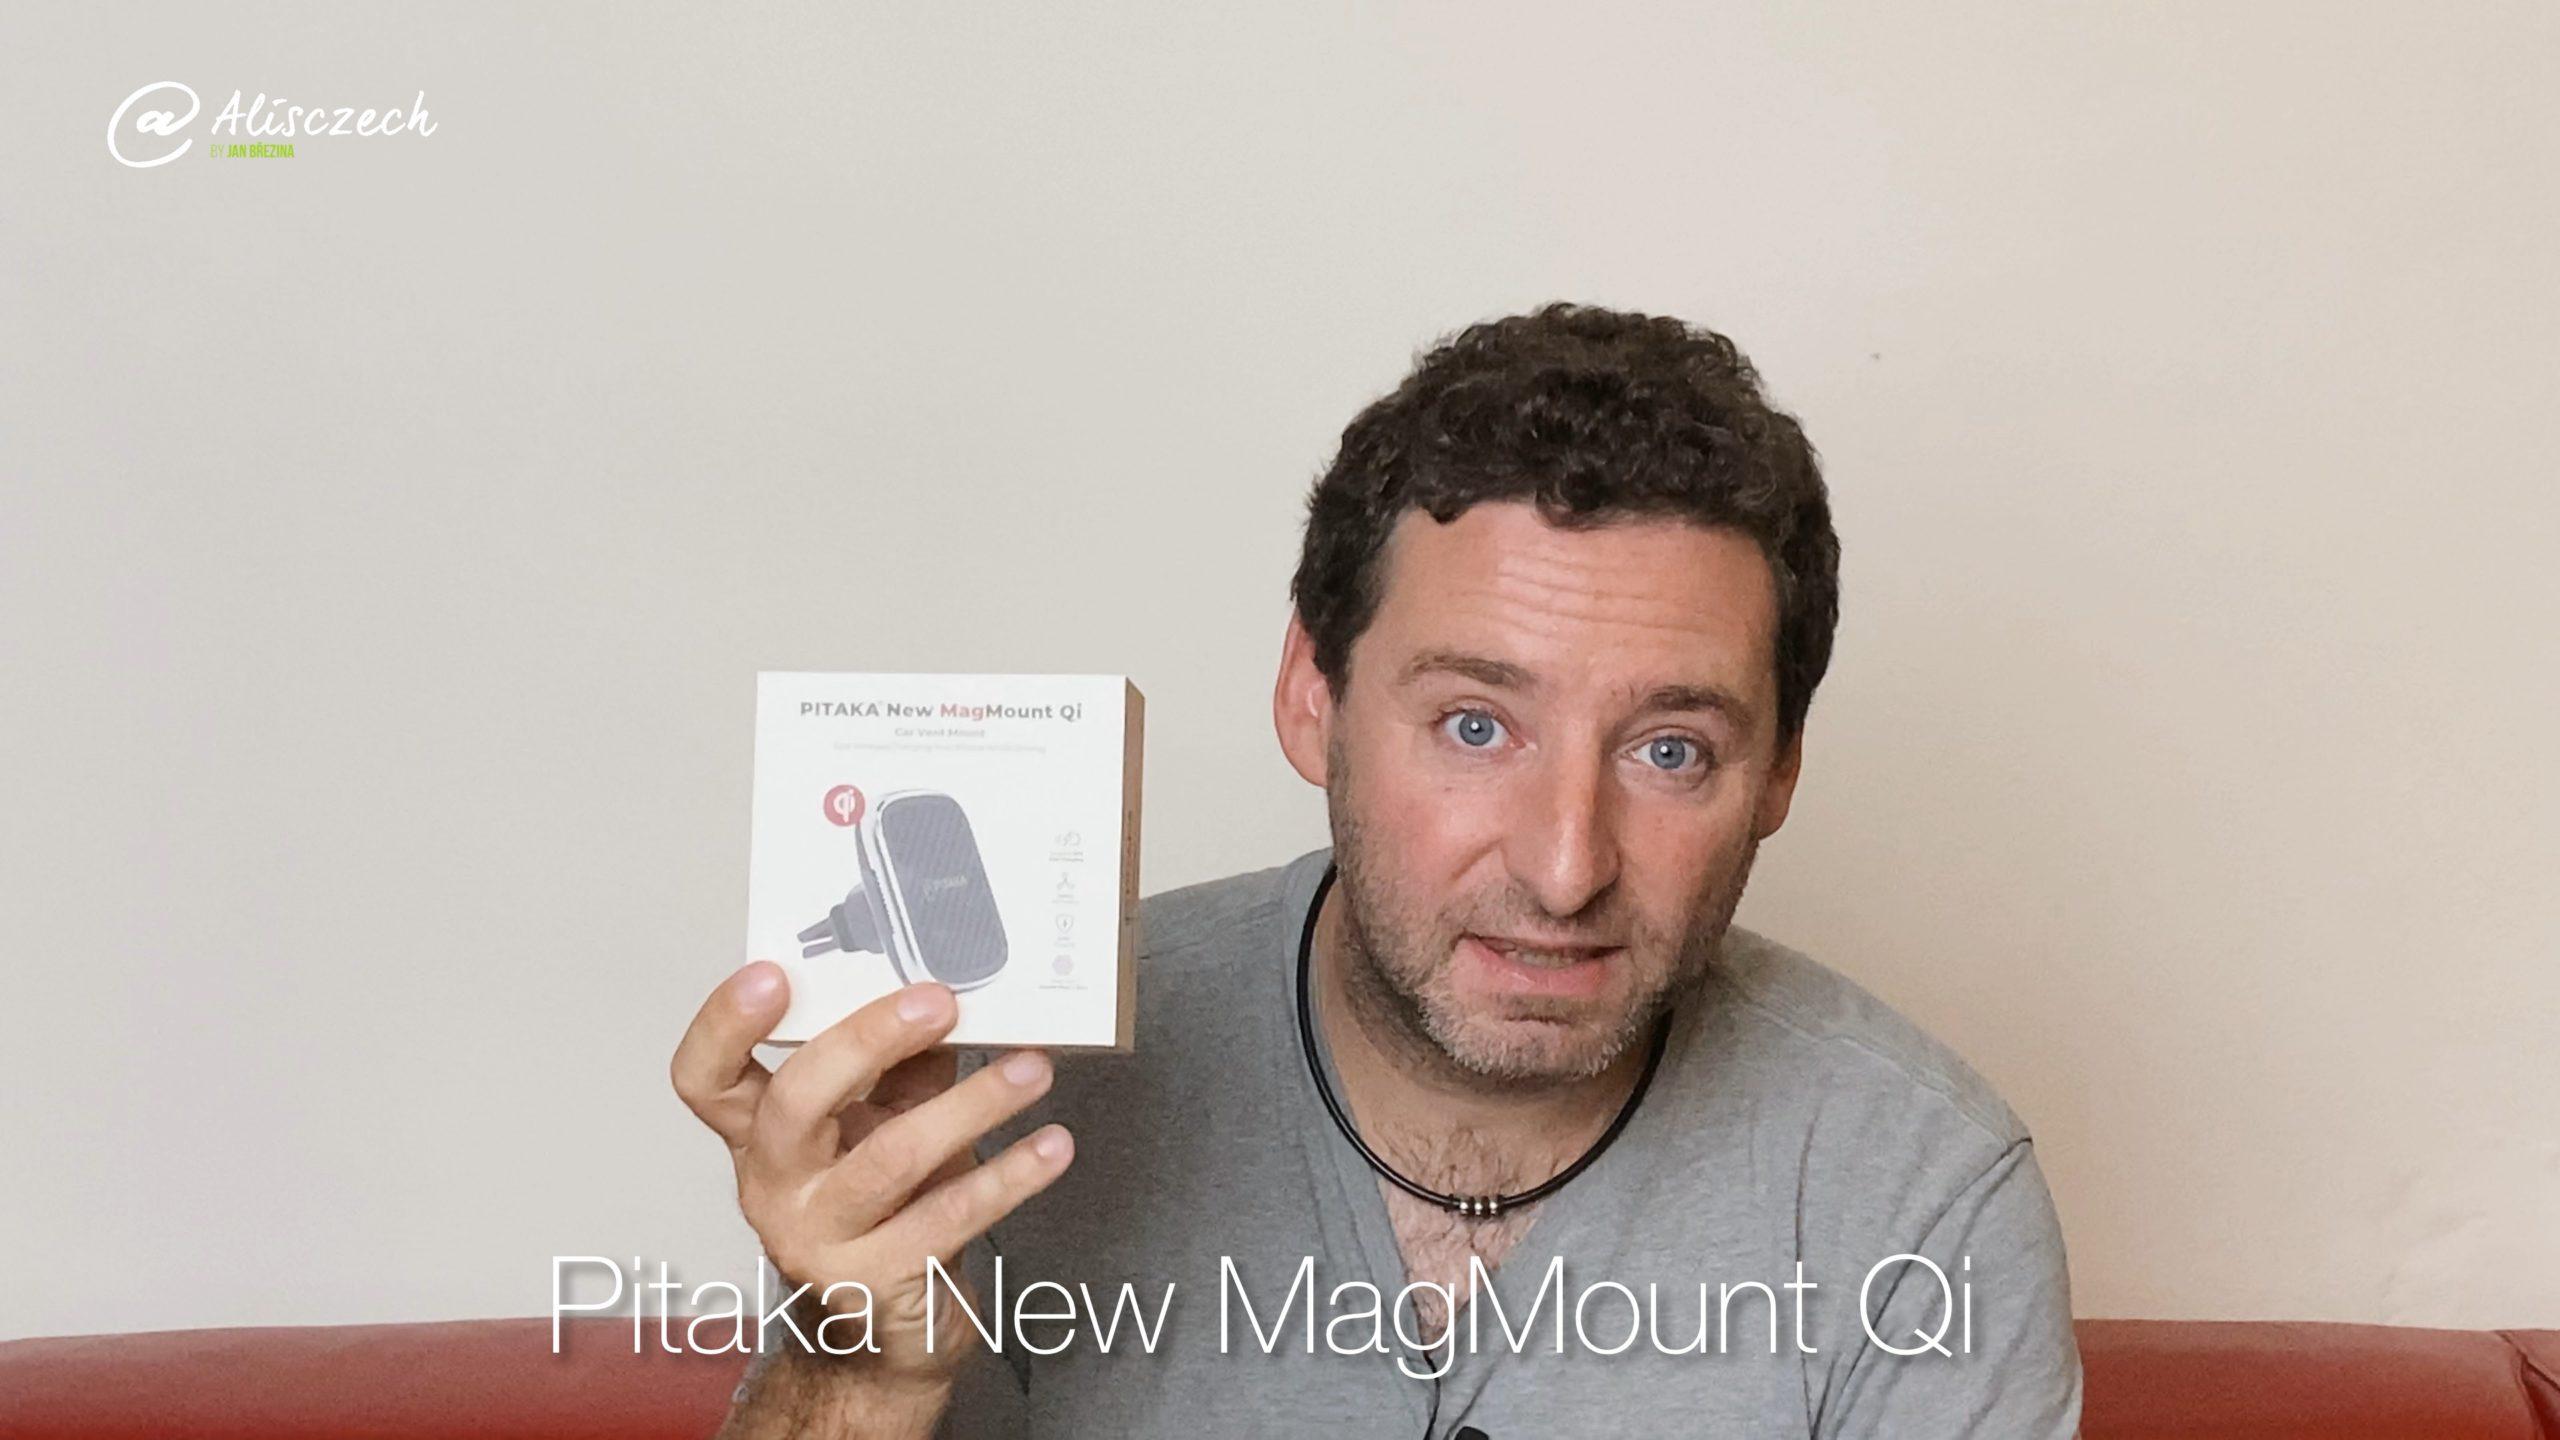 Pitaka New MagMount Qi